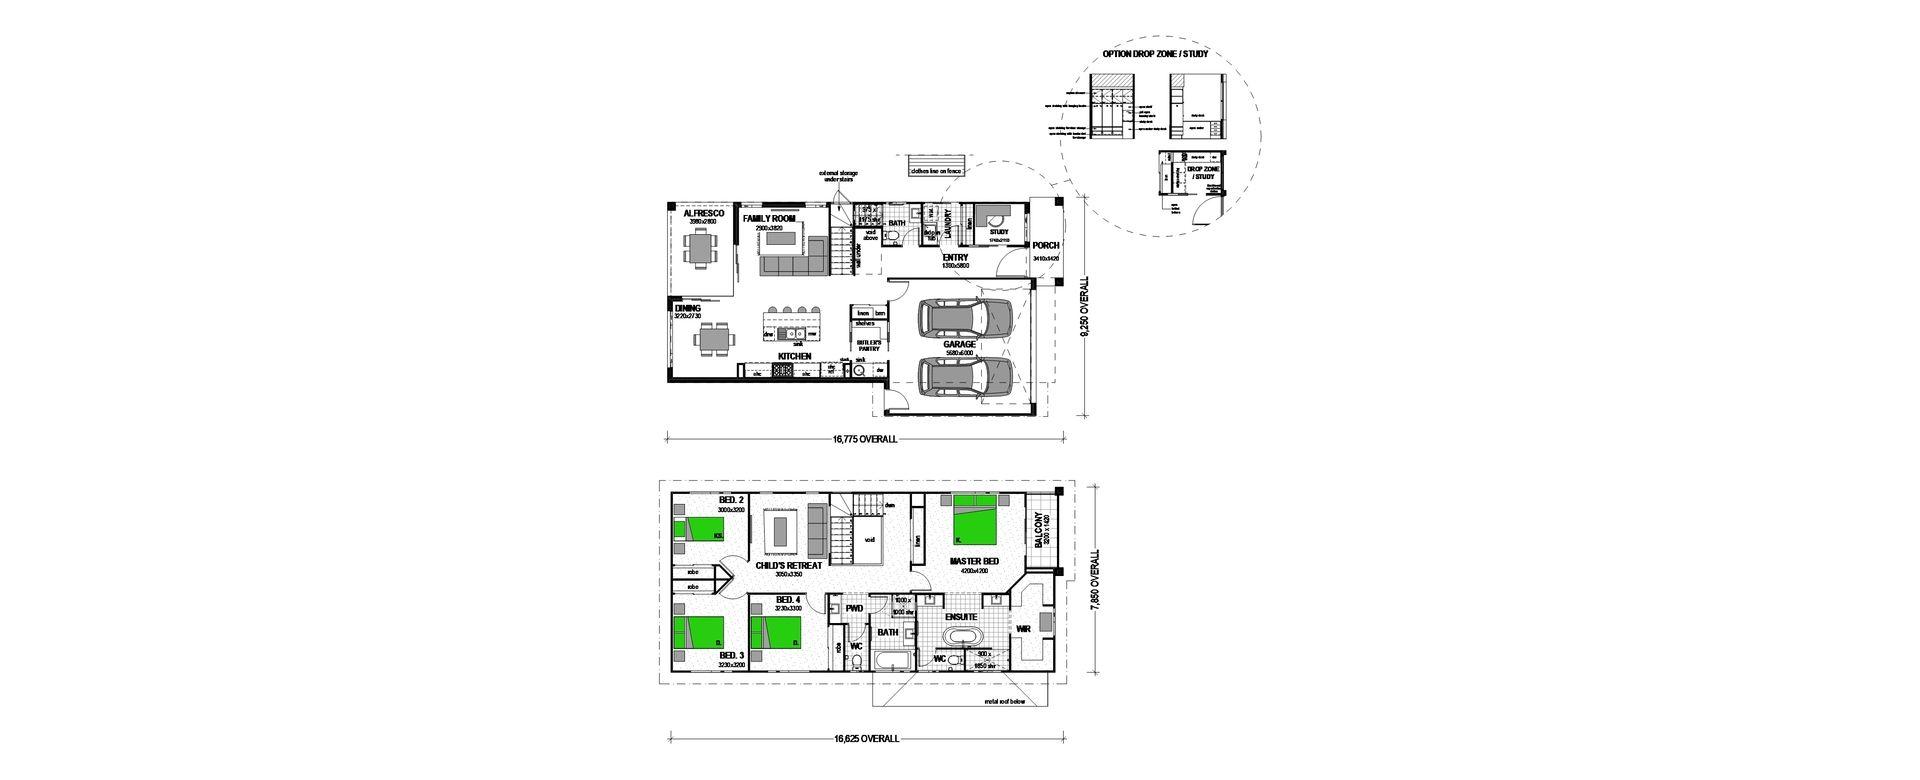 Lot 39 Stretton Reserve, Stretton QLD 4116, Image 1